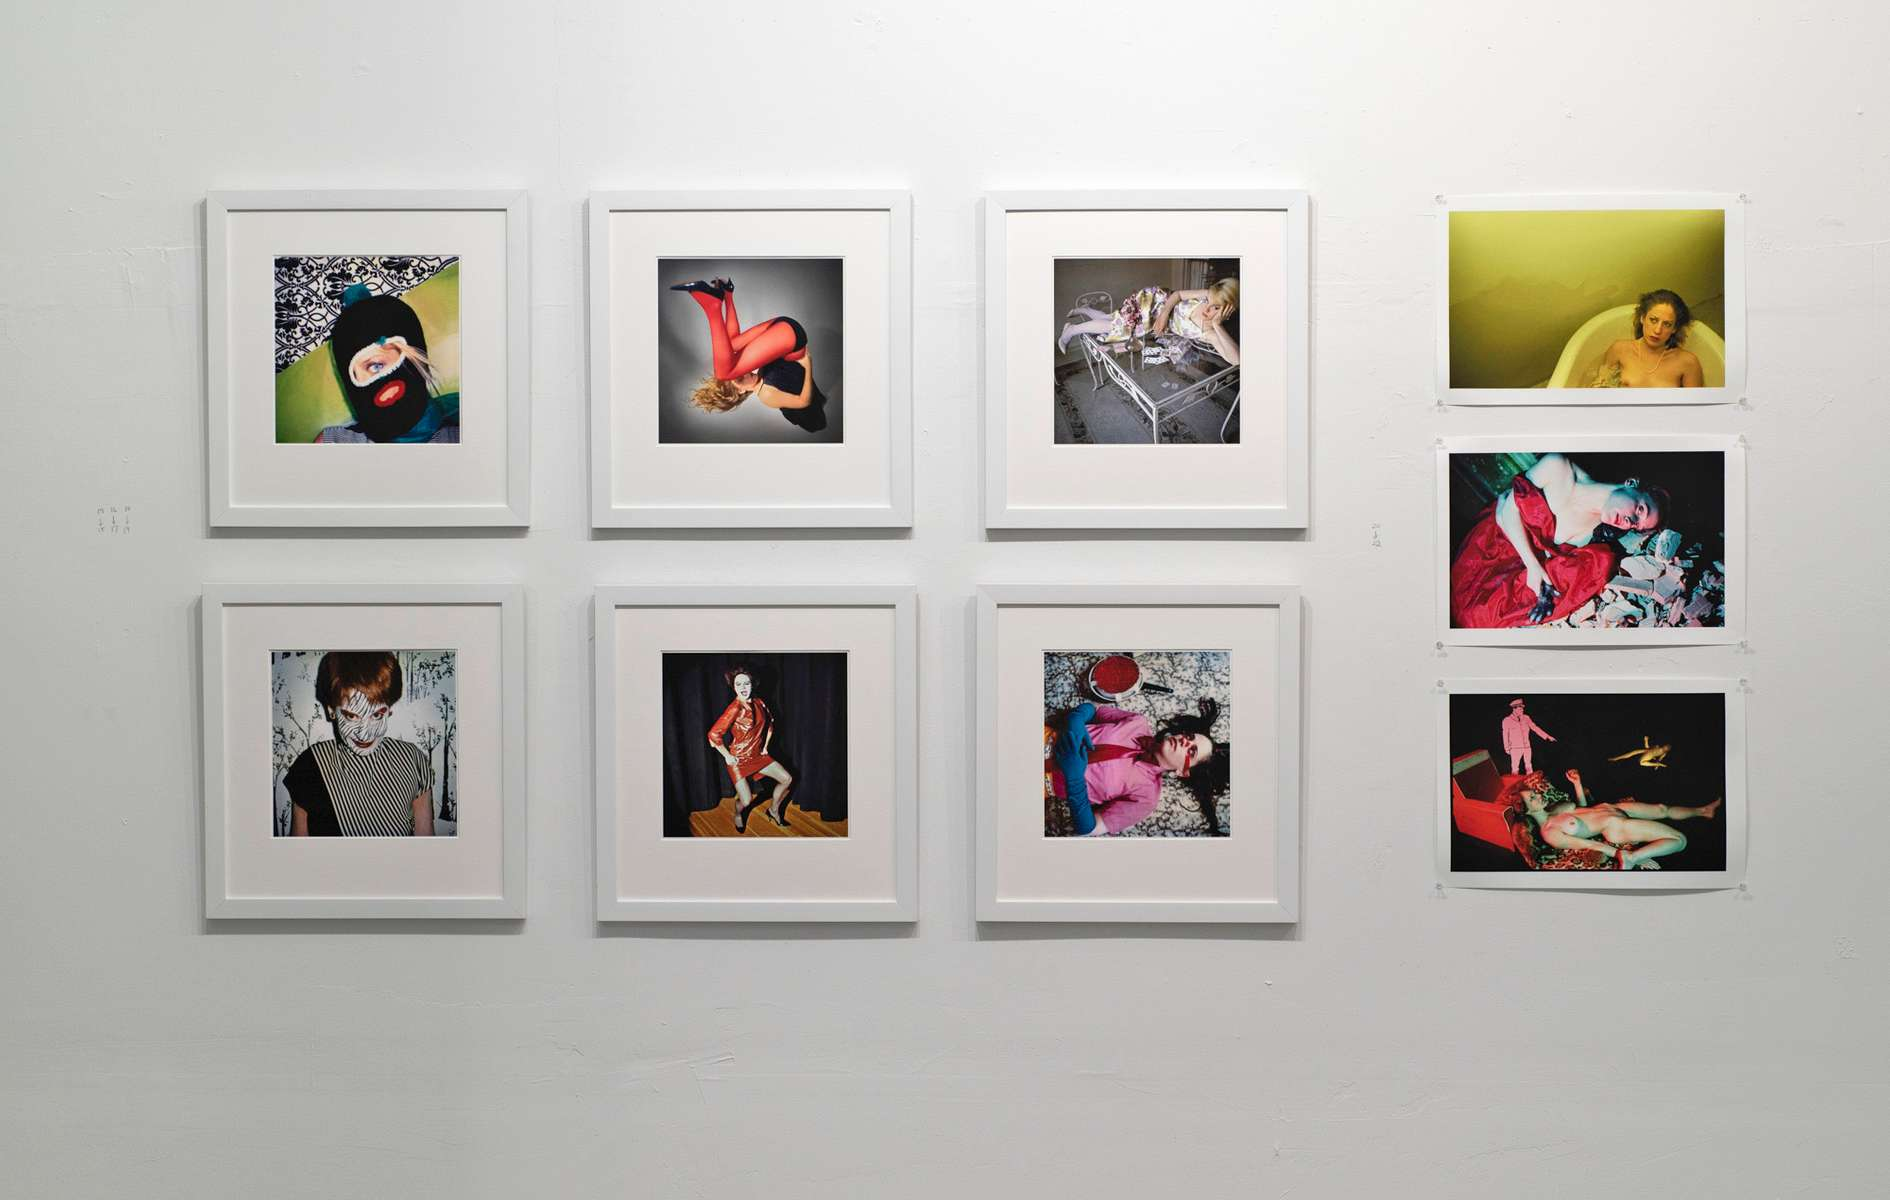 Installation View of Gillen's Photographs